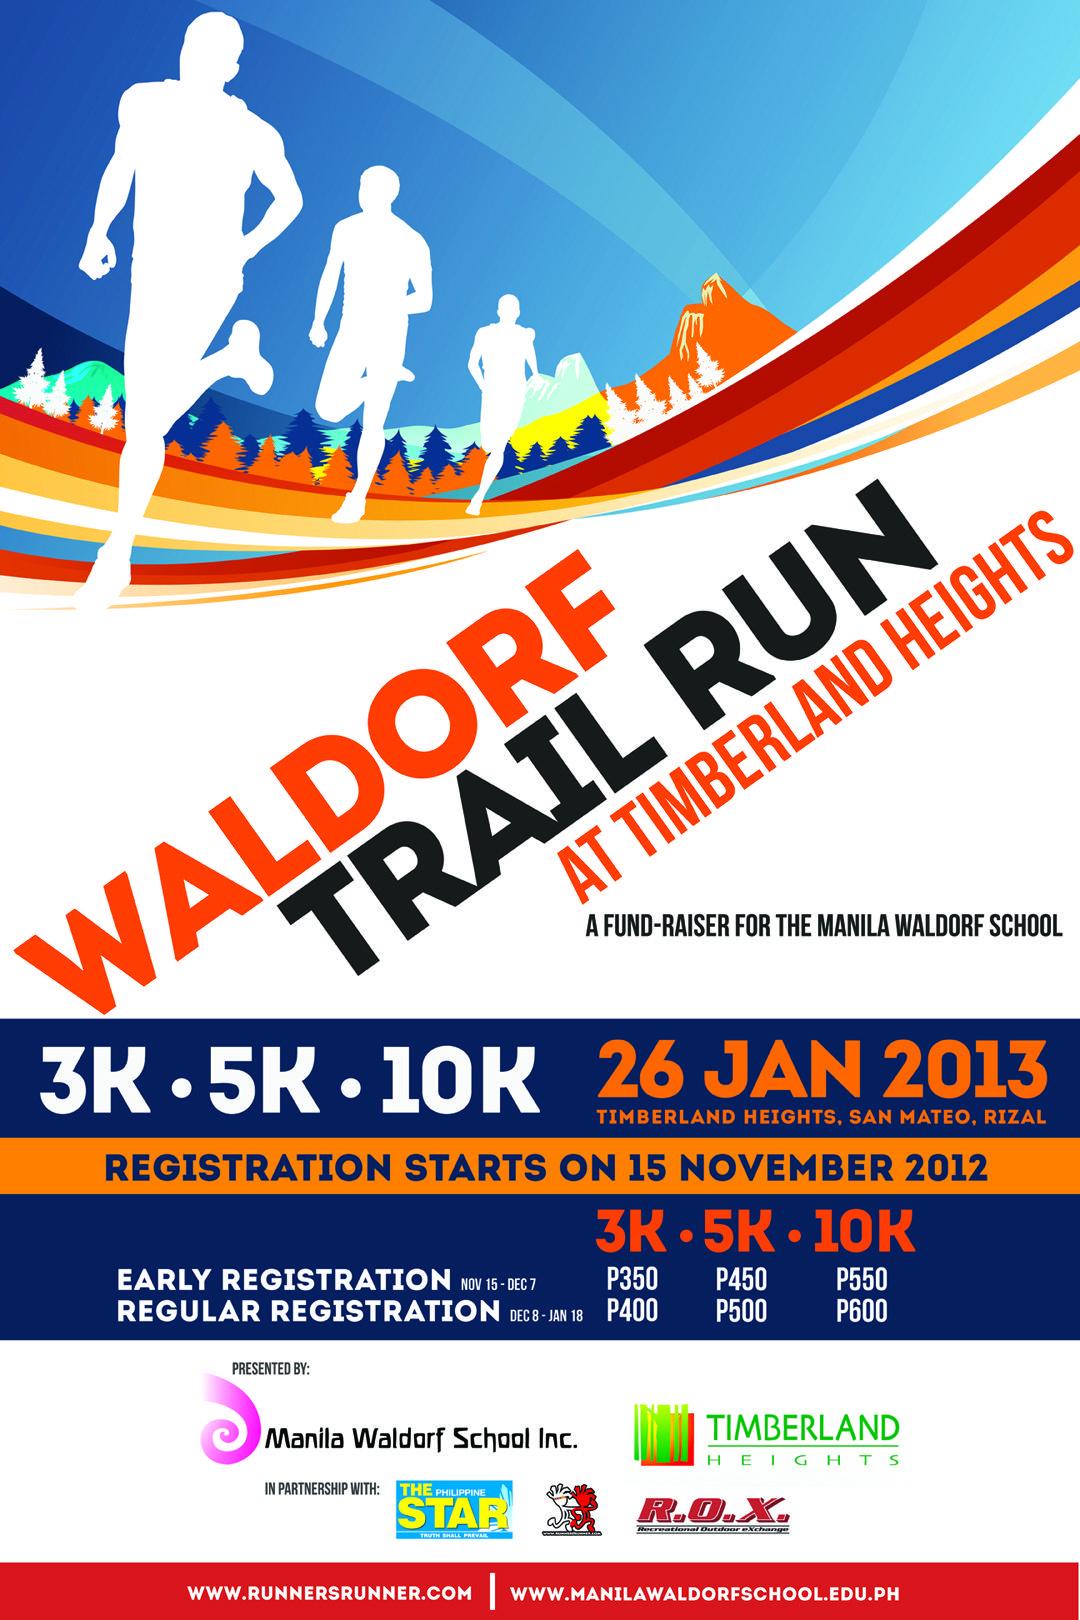 Running Waldorf Trail Run Race Branding Ideas